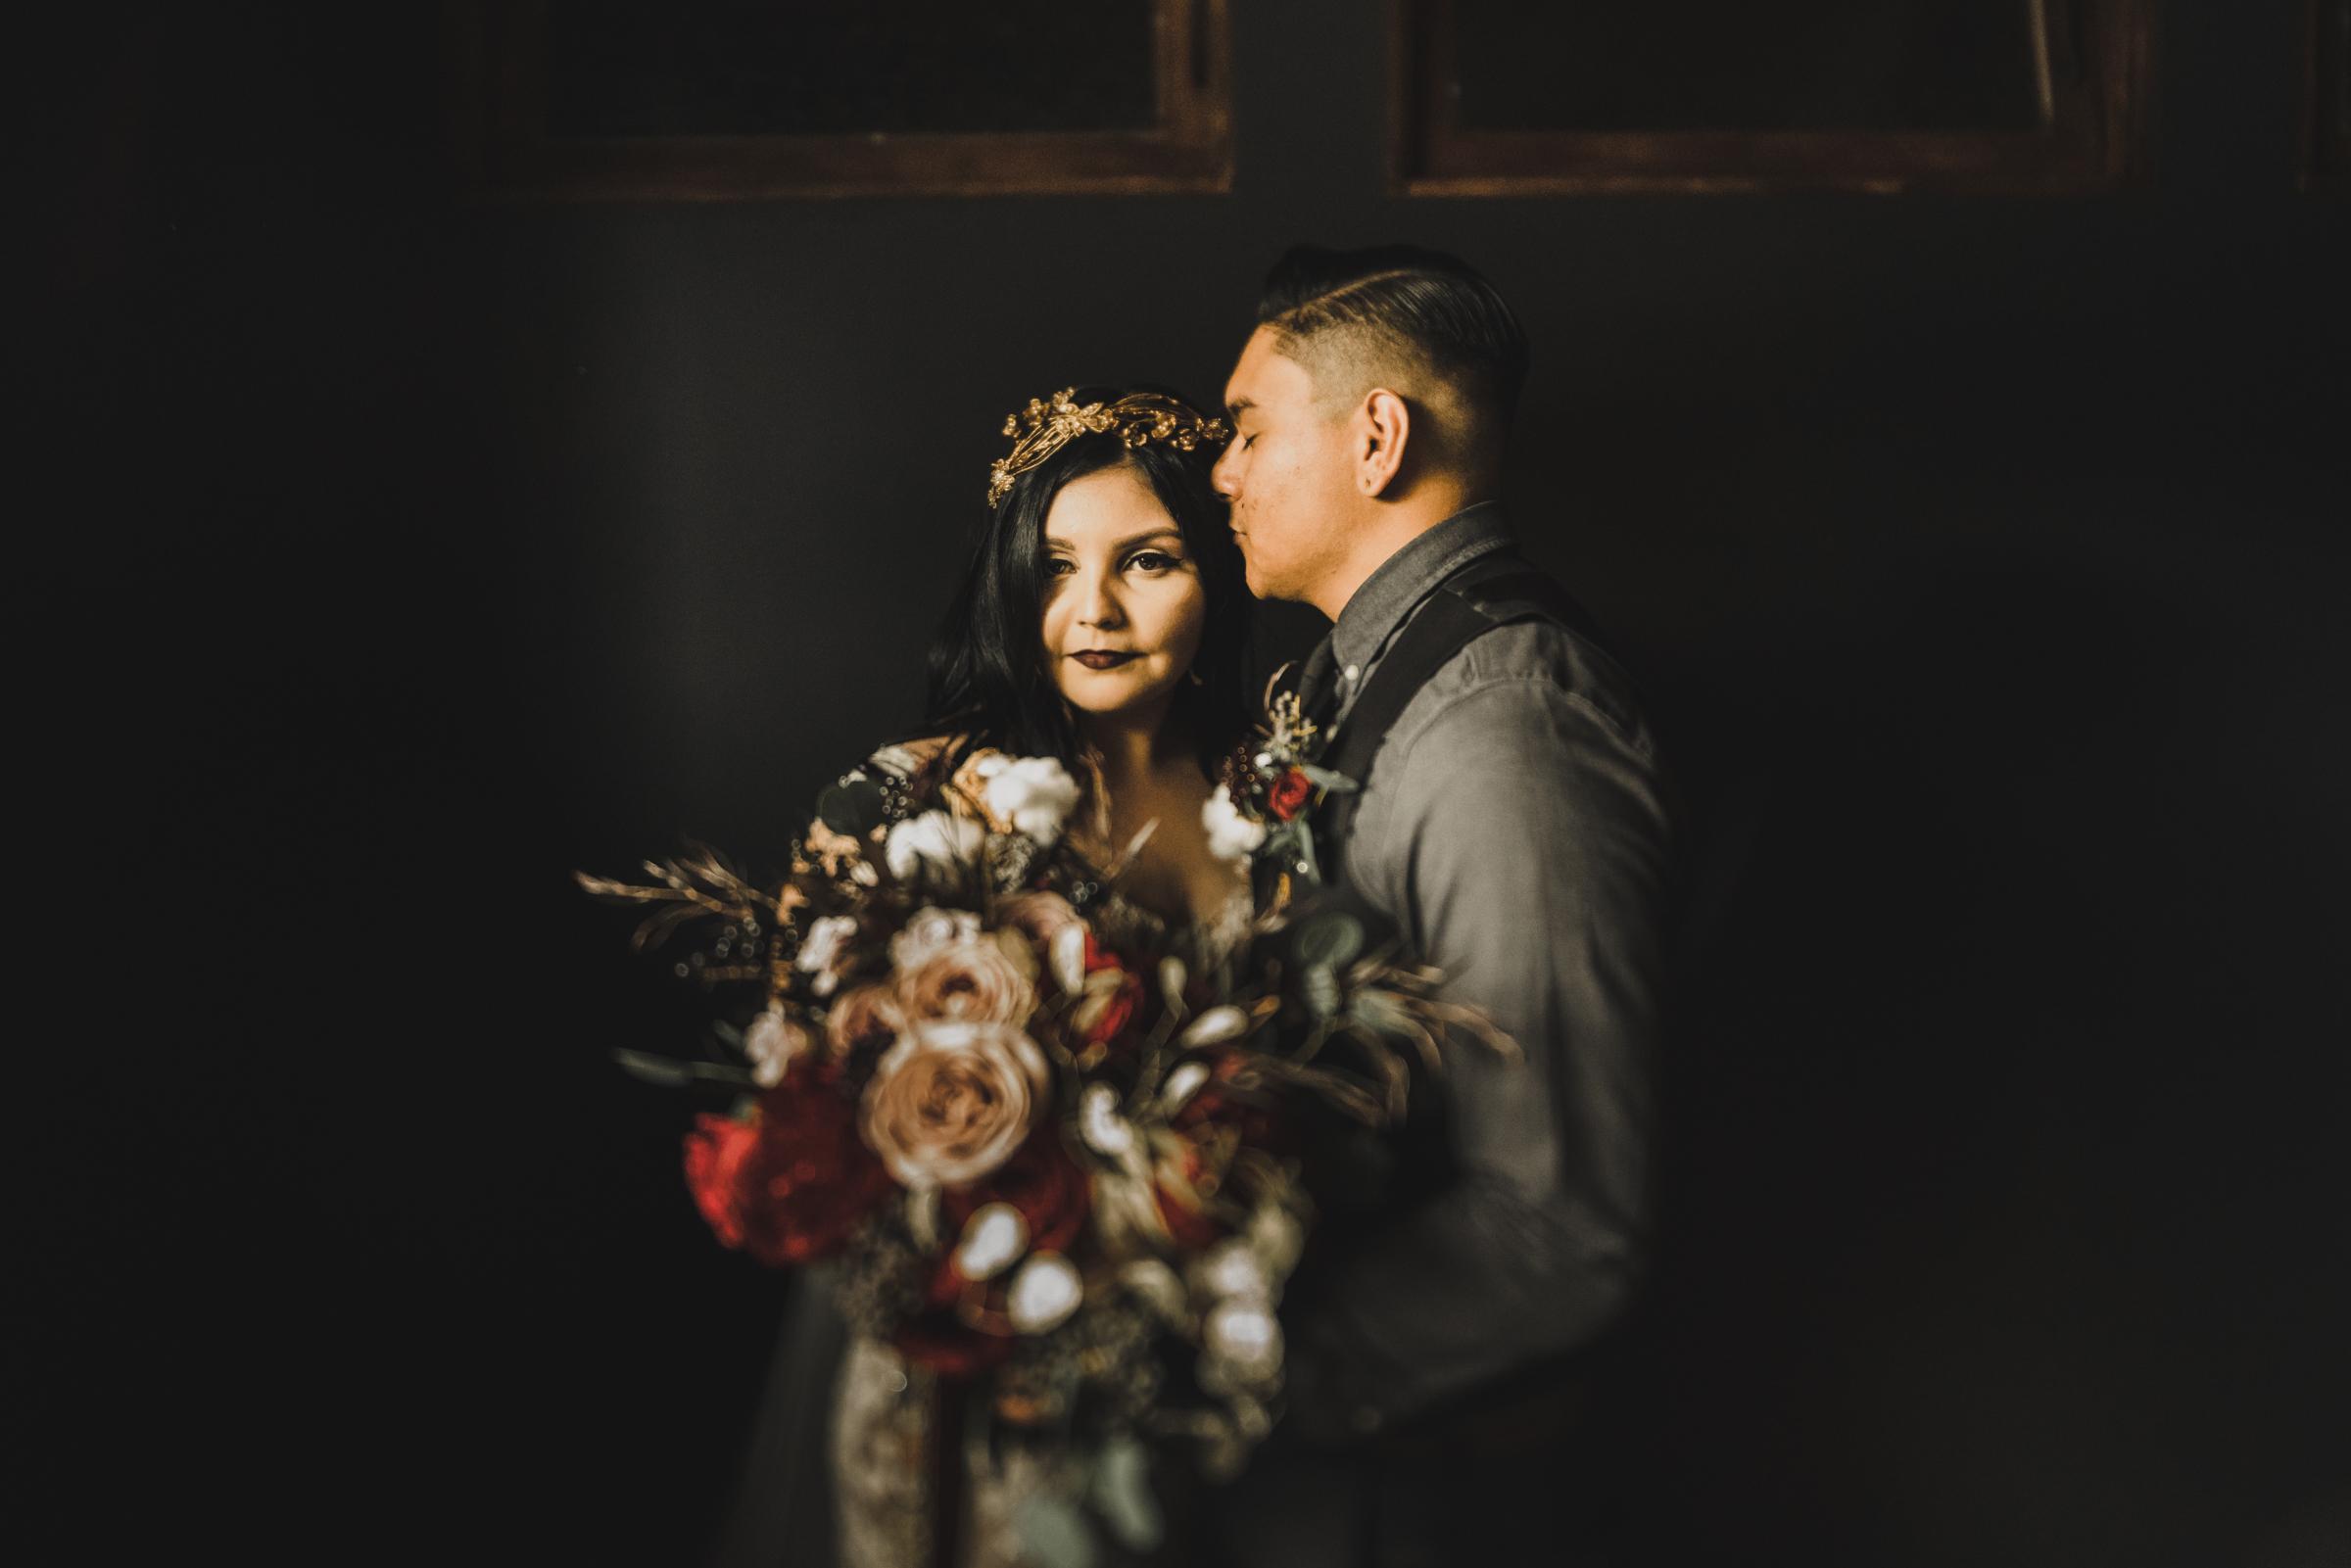 ©Isaiah + Taylor Photography - Smoky Hollow Studios Wedding, El Segundo, Los Angeles Wedding Photographer-60.jpg